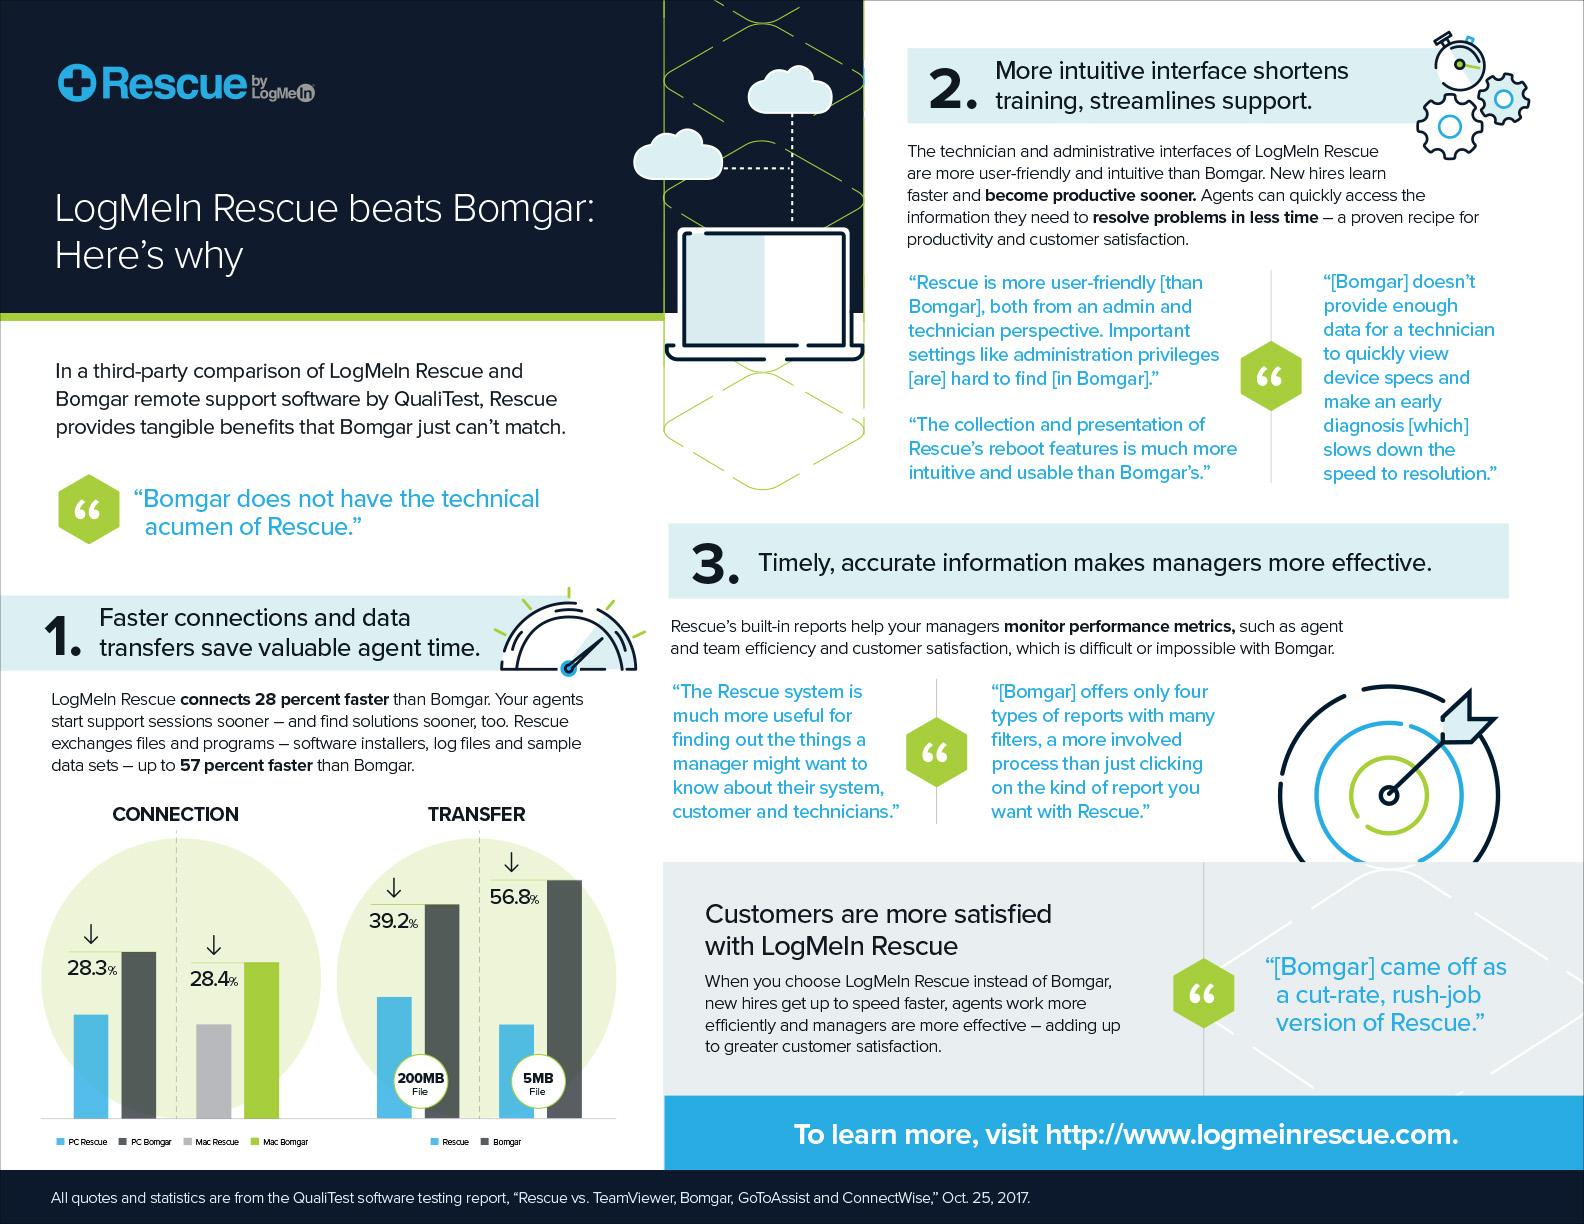 Infographic: LogMeIn Rescue vs Bomgar